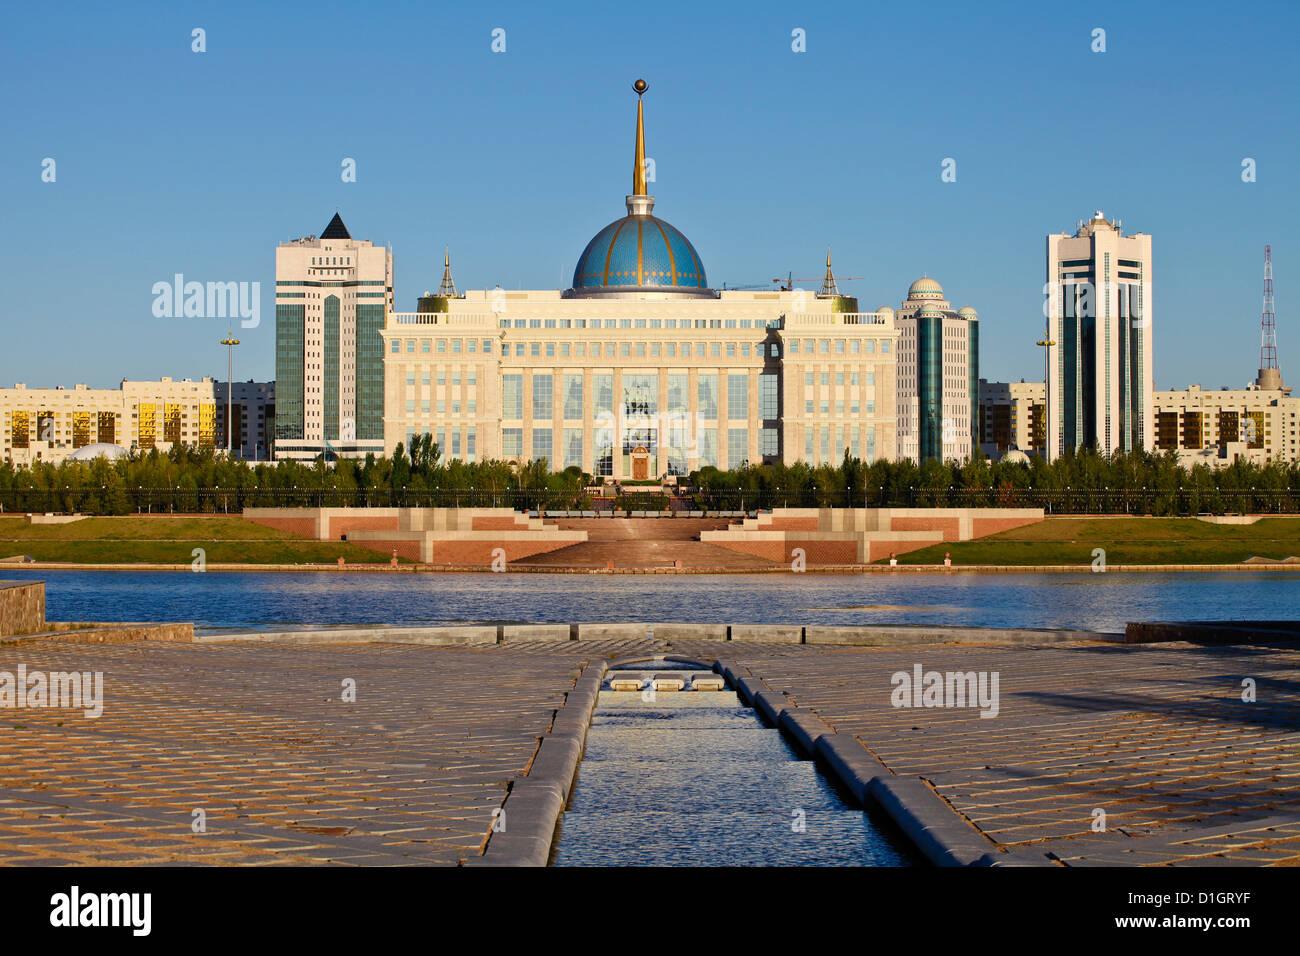 View of The Ak Orda Presidential Palace of President Nursultan Nazarbayev reflecting in Ishim River, Kazakhstan, - Stock Image